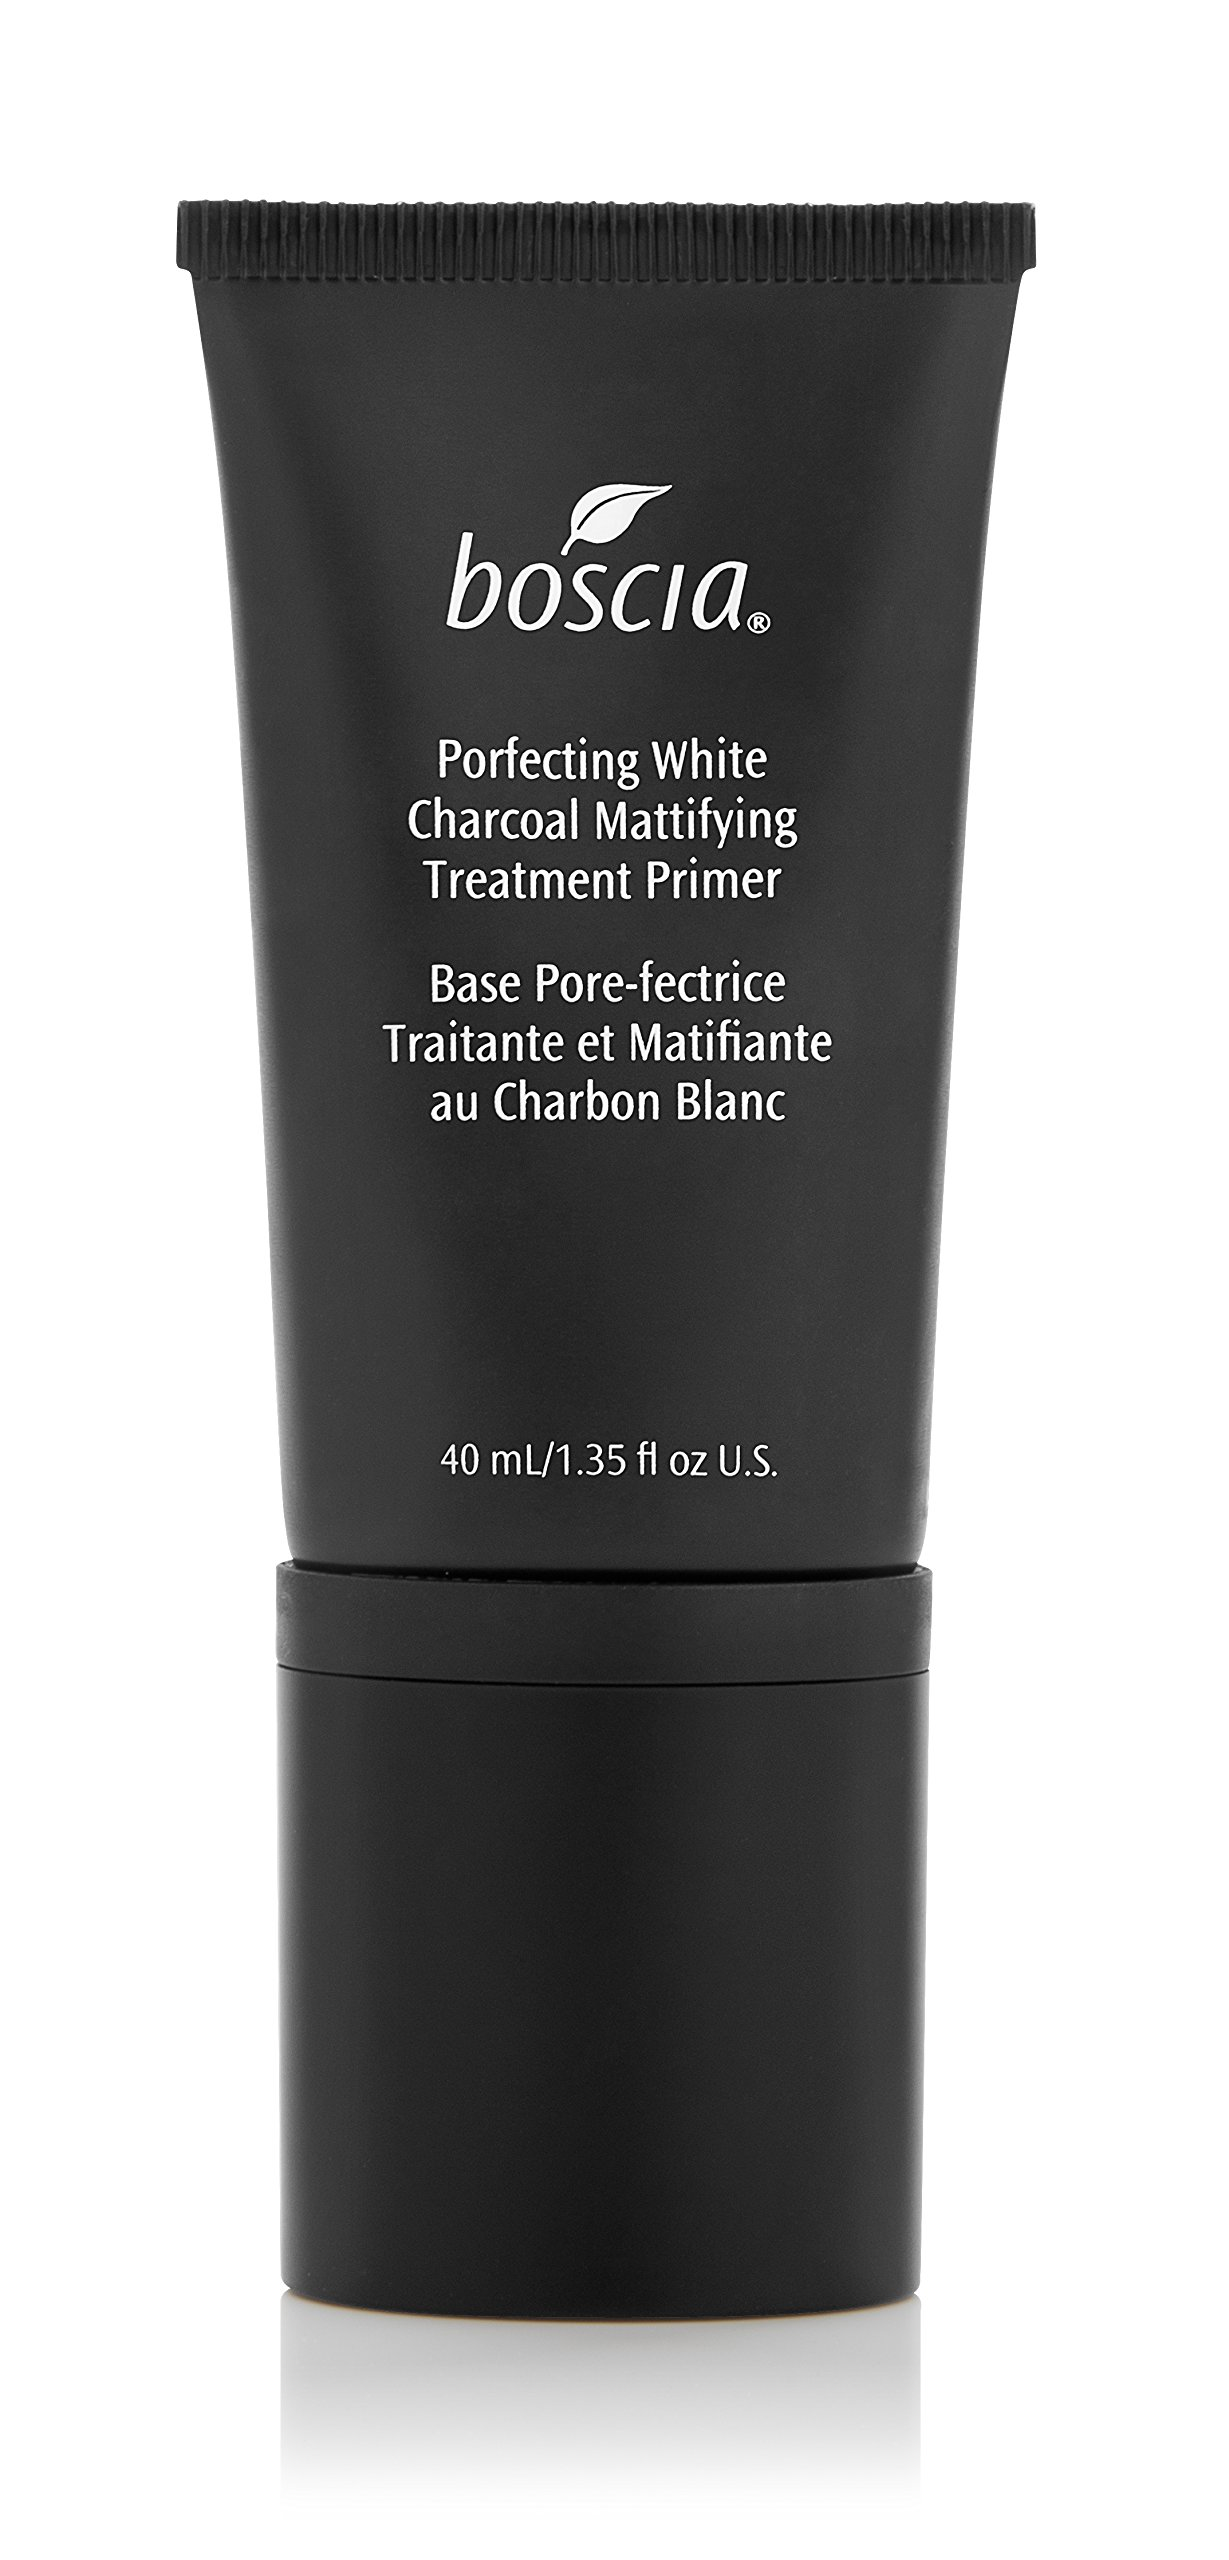 boscia Porefecting White Charcoal Mattifying Treatment Primer - Vegan Makeup Face Primer with Binchotan and Witch Hazel for Oily Skin, 40mL